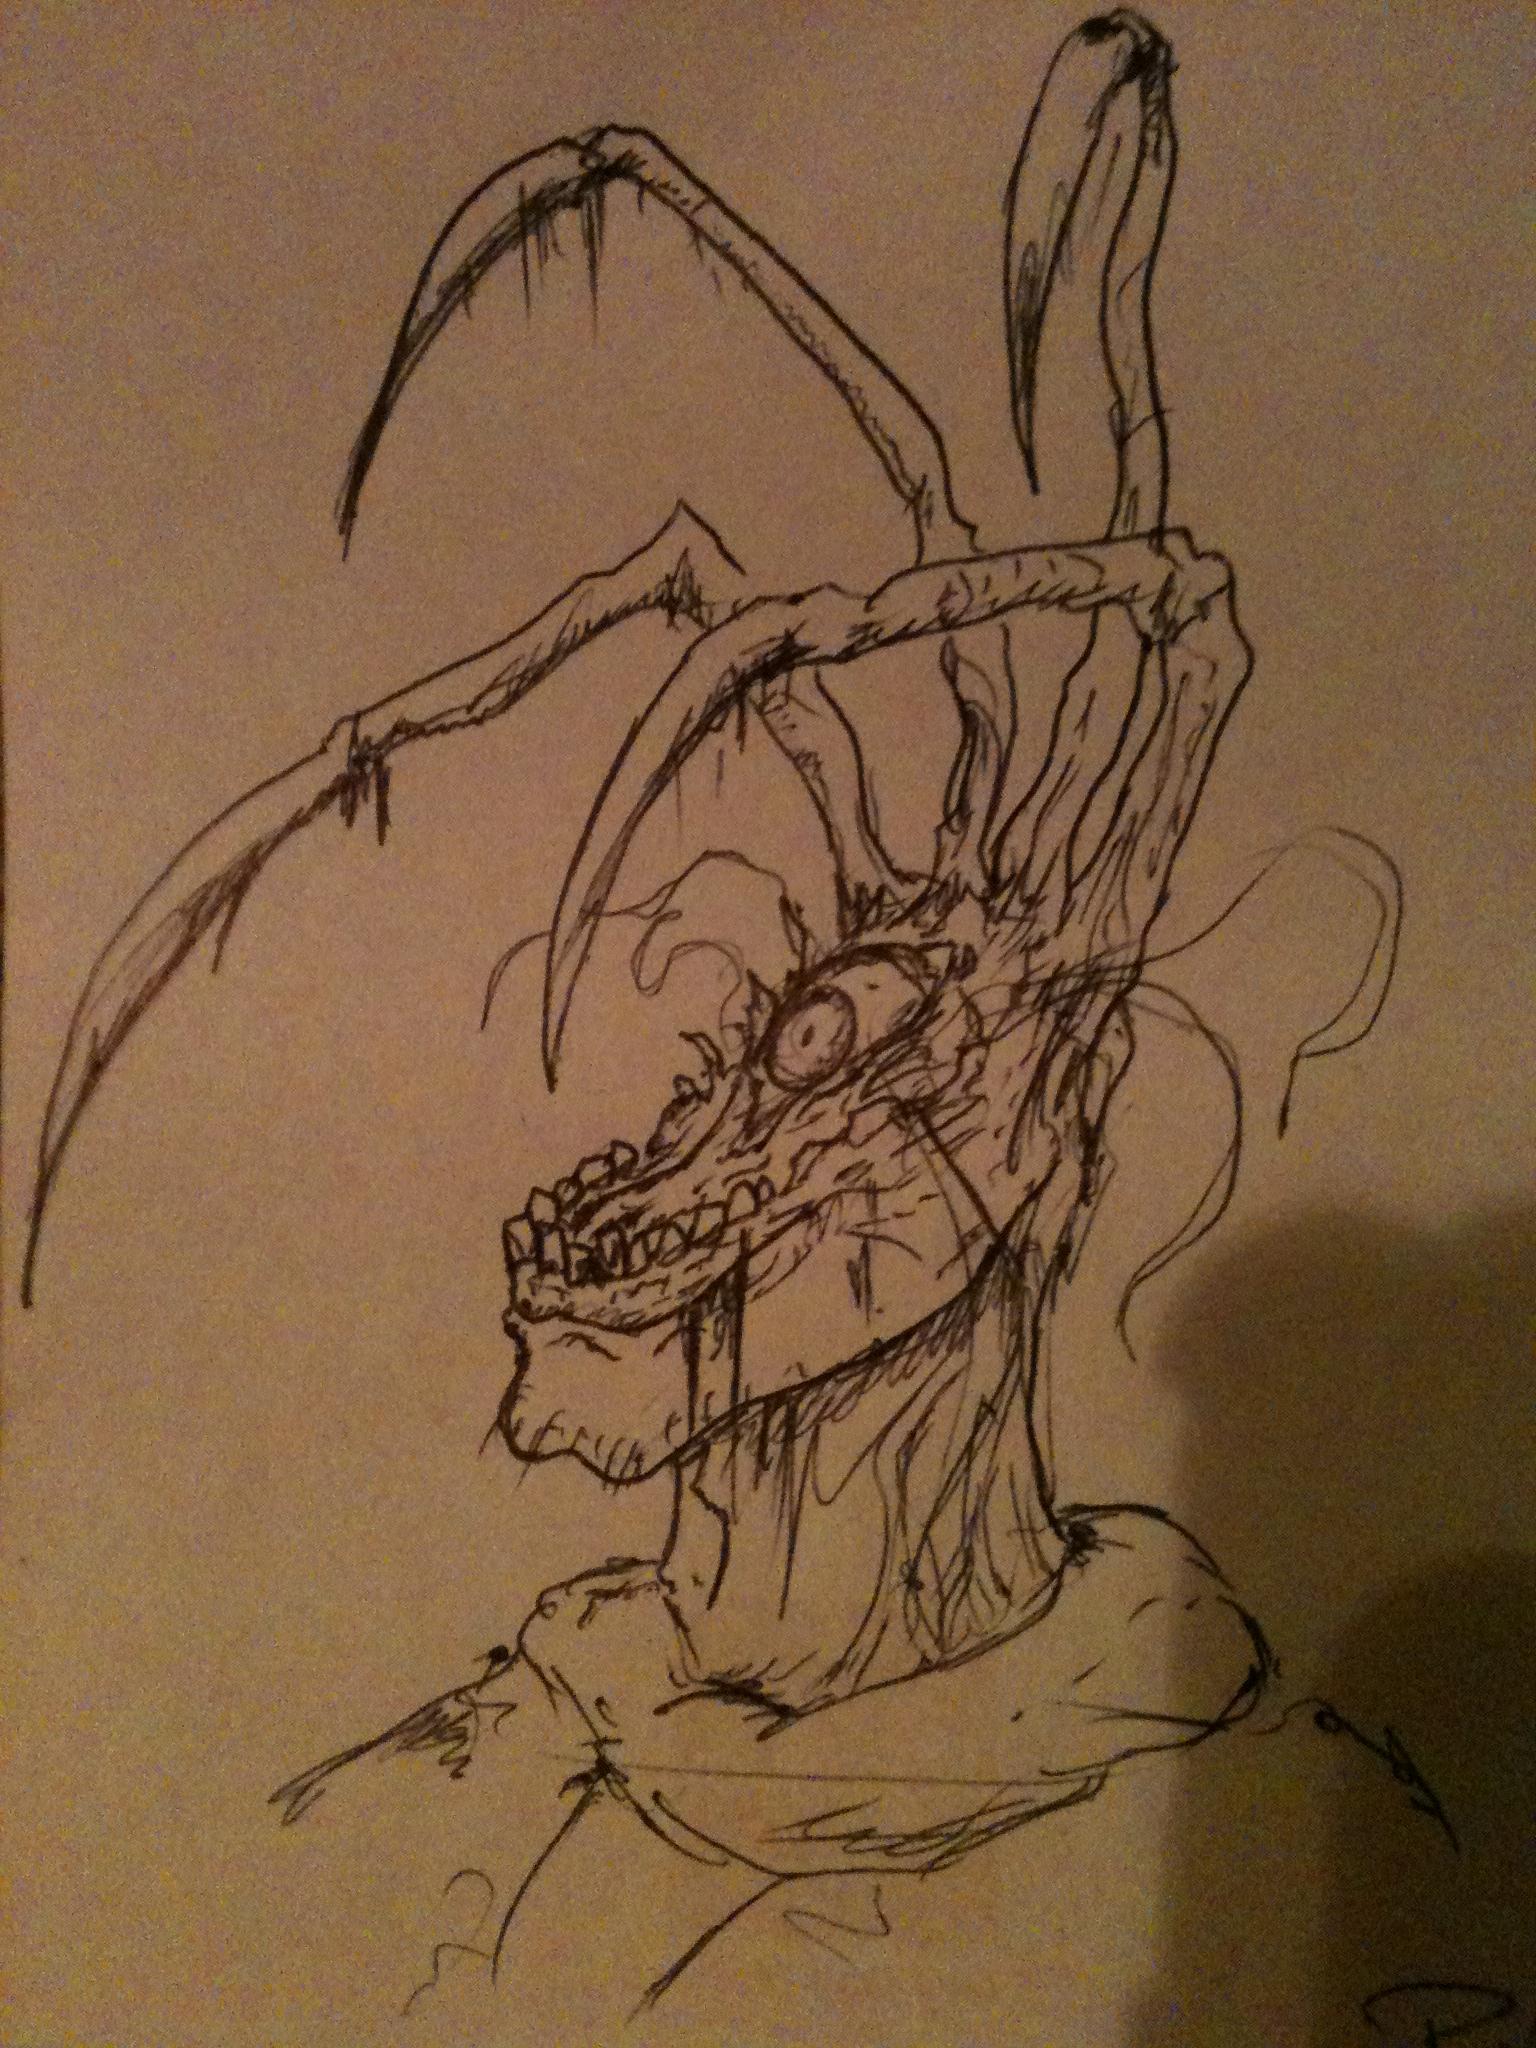 Strange Head Thing Sketch.